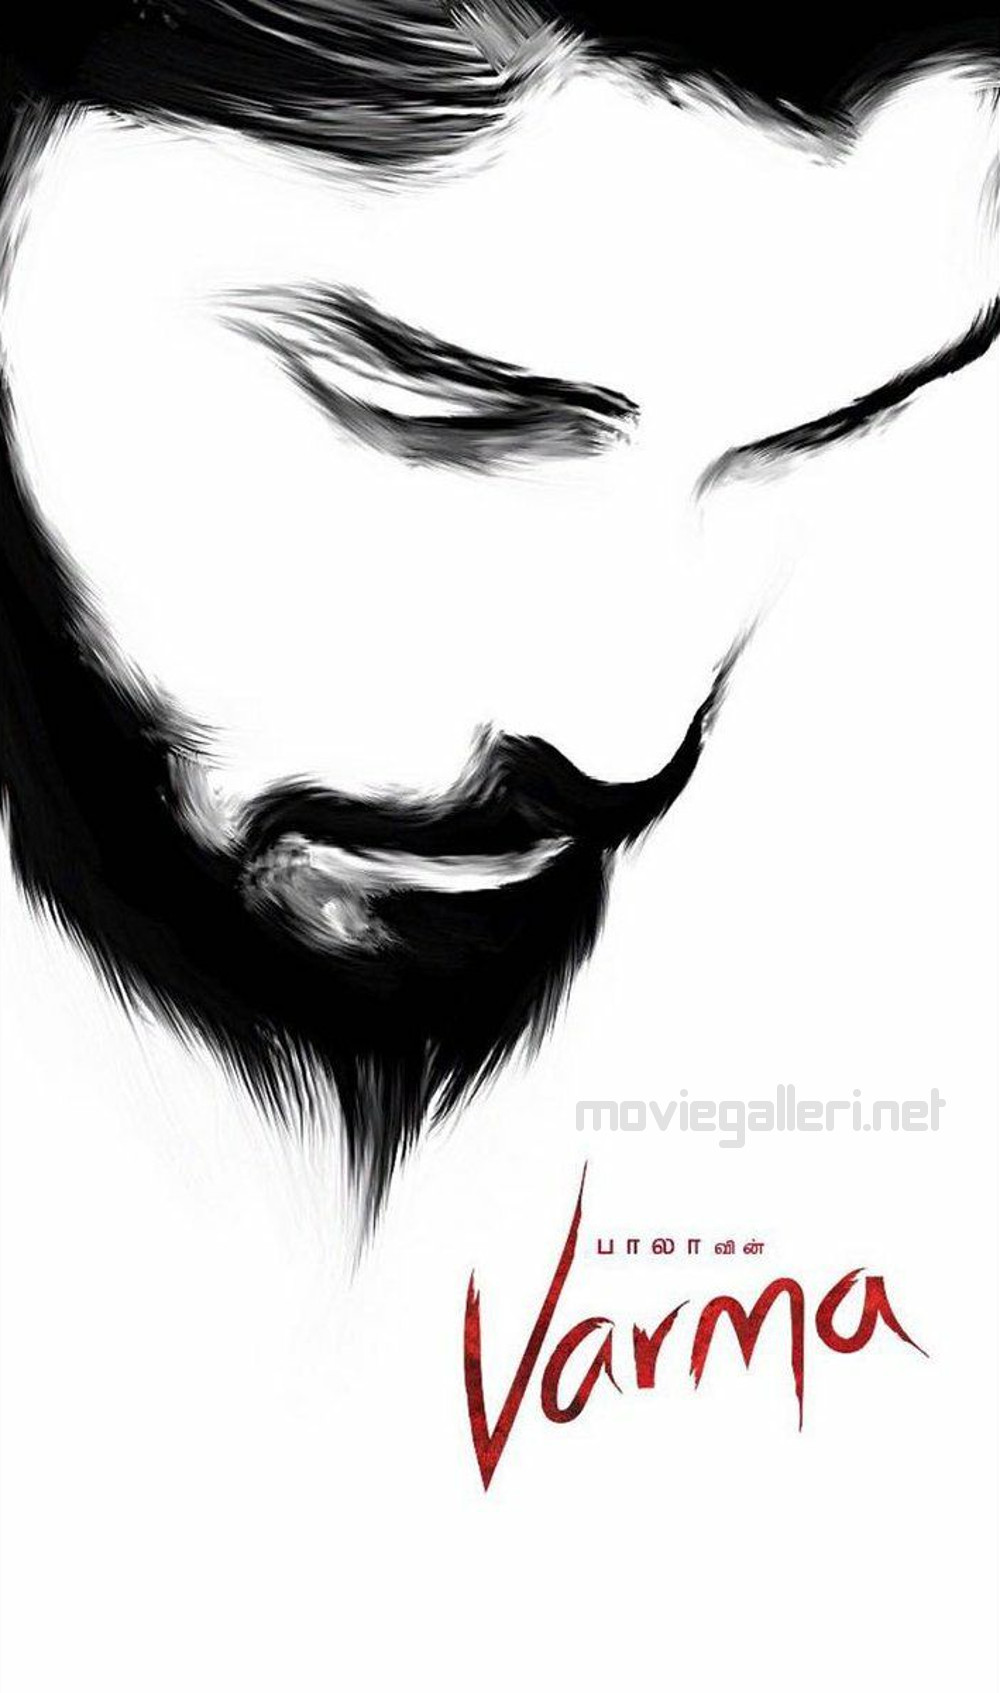 Director Bala Vikram Son Dhruv Varma First Look Title Poster